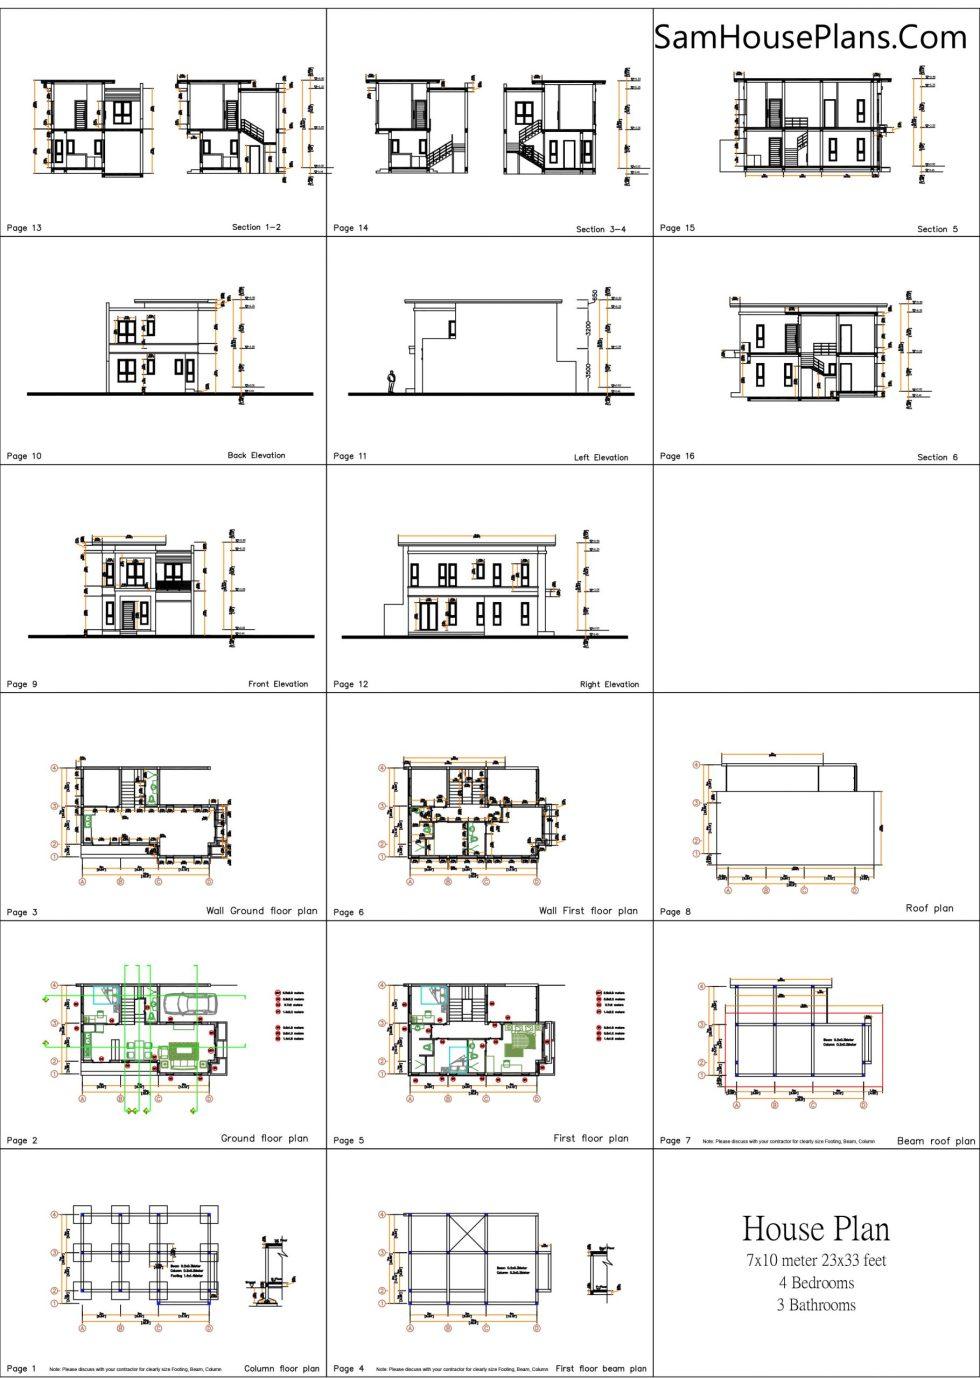 All layout plan Home Plan 7x10 Meter 4 Bedrooms